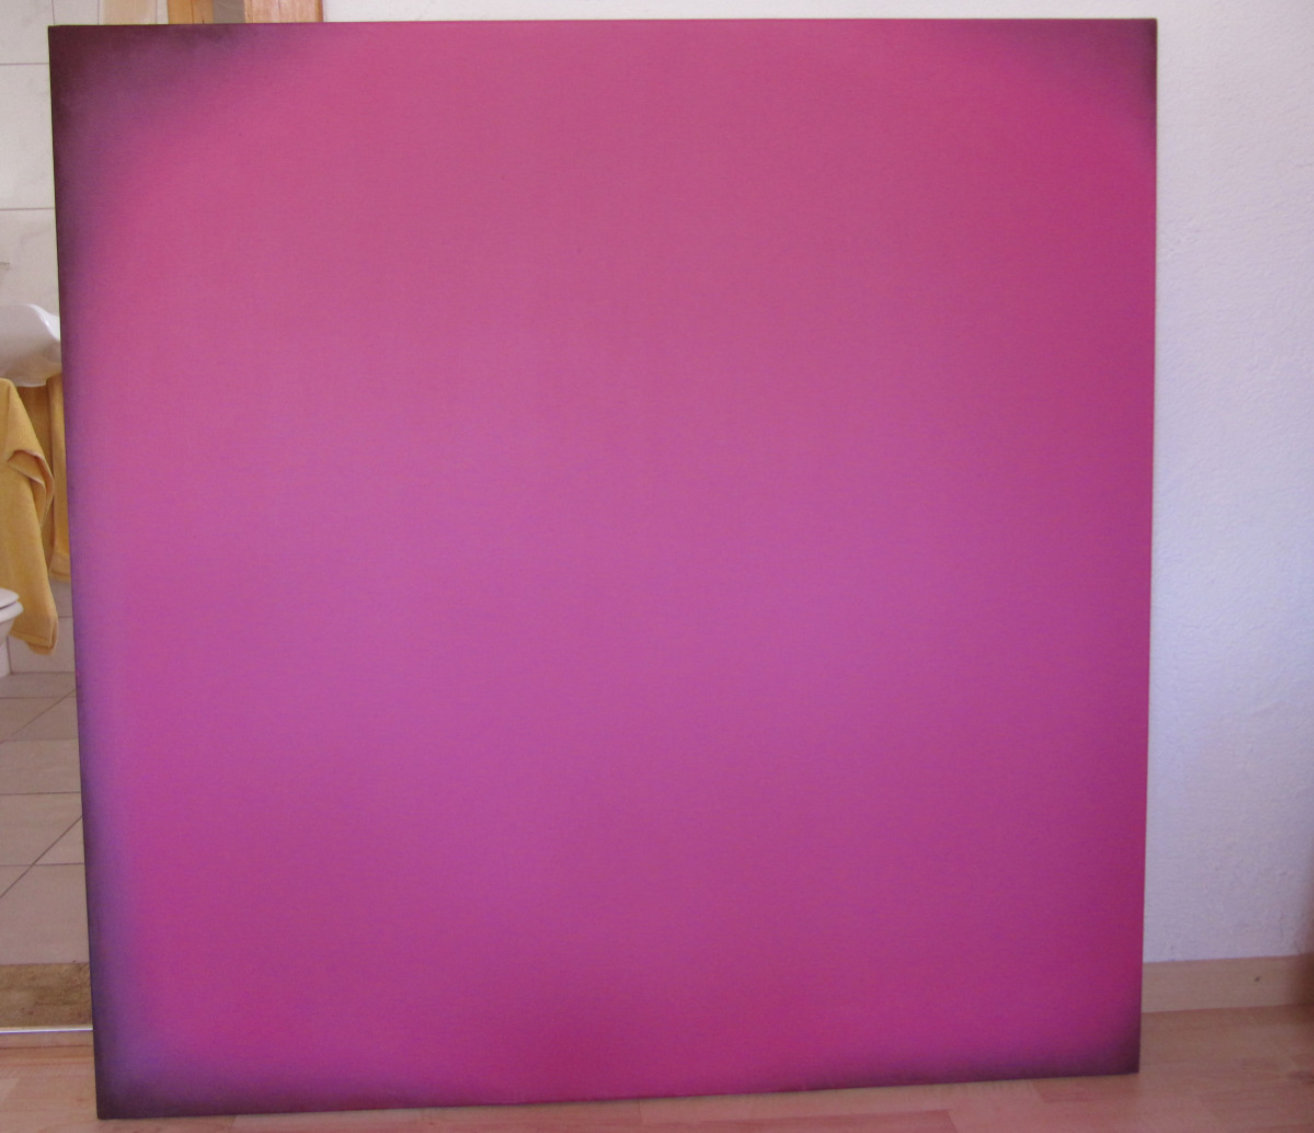 radical painting - chinacridon, 2009